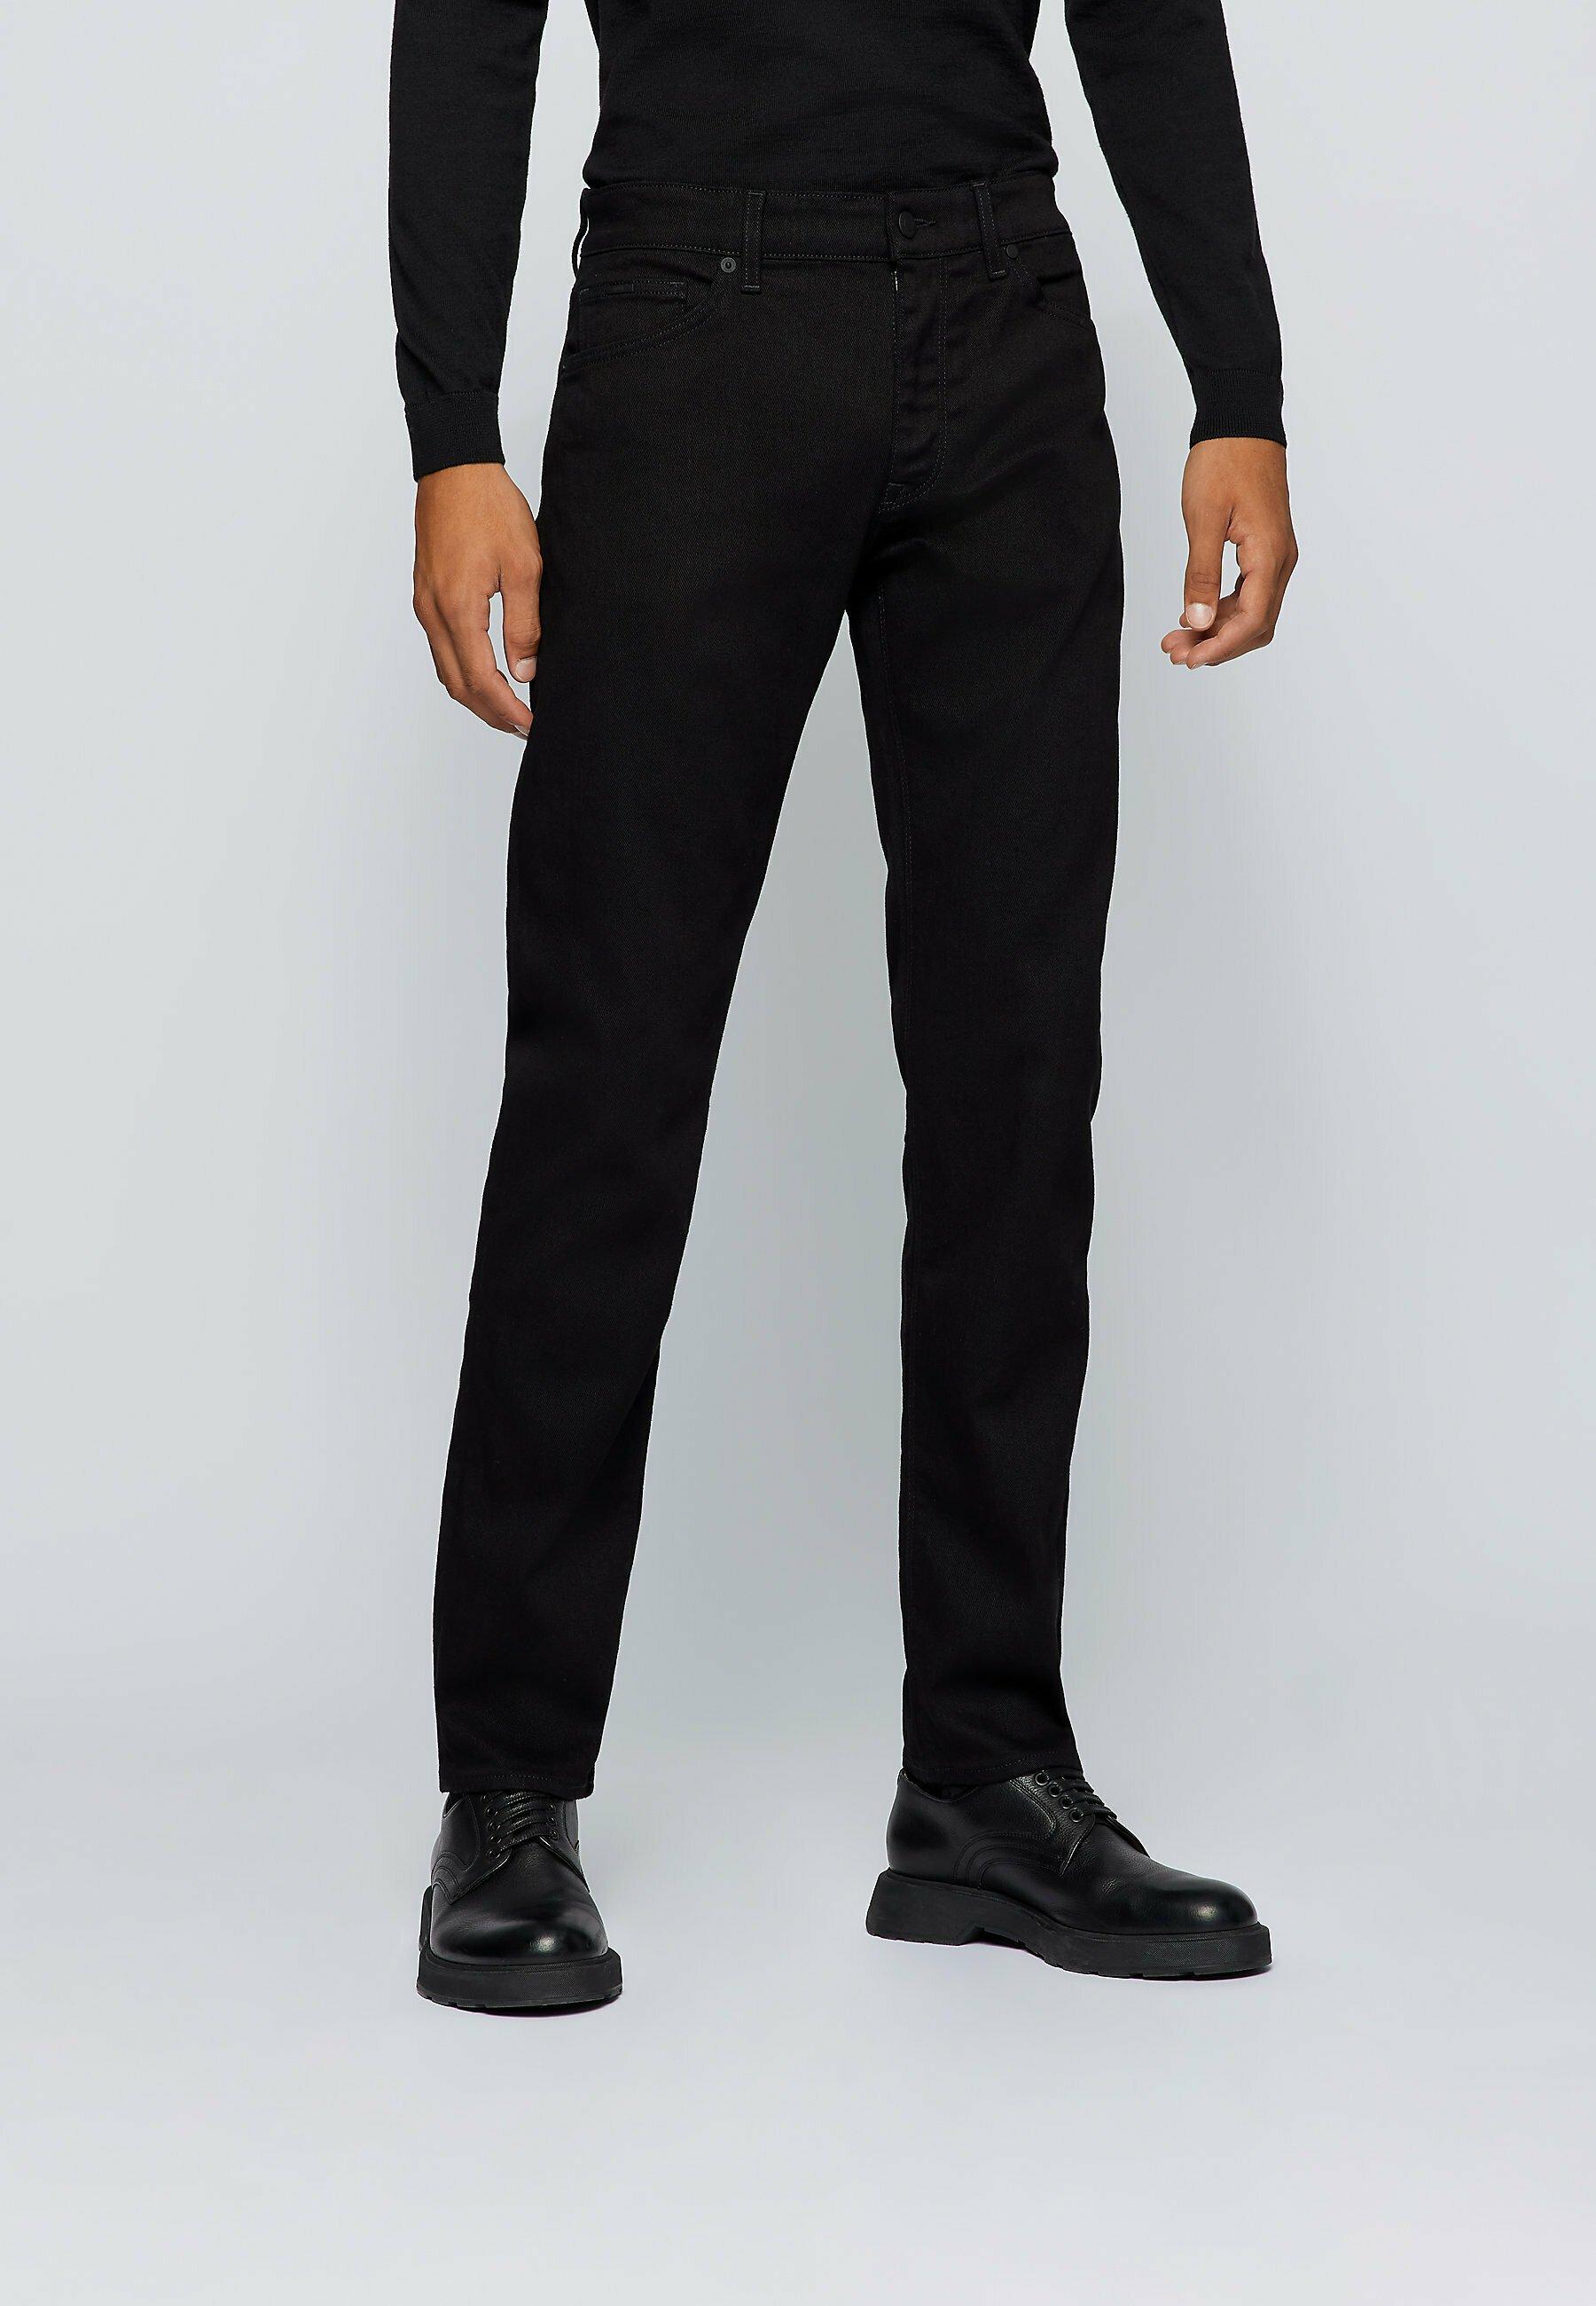 Uomo MAINE3 - Jeans slim fit